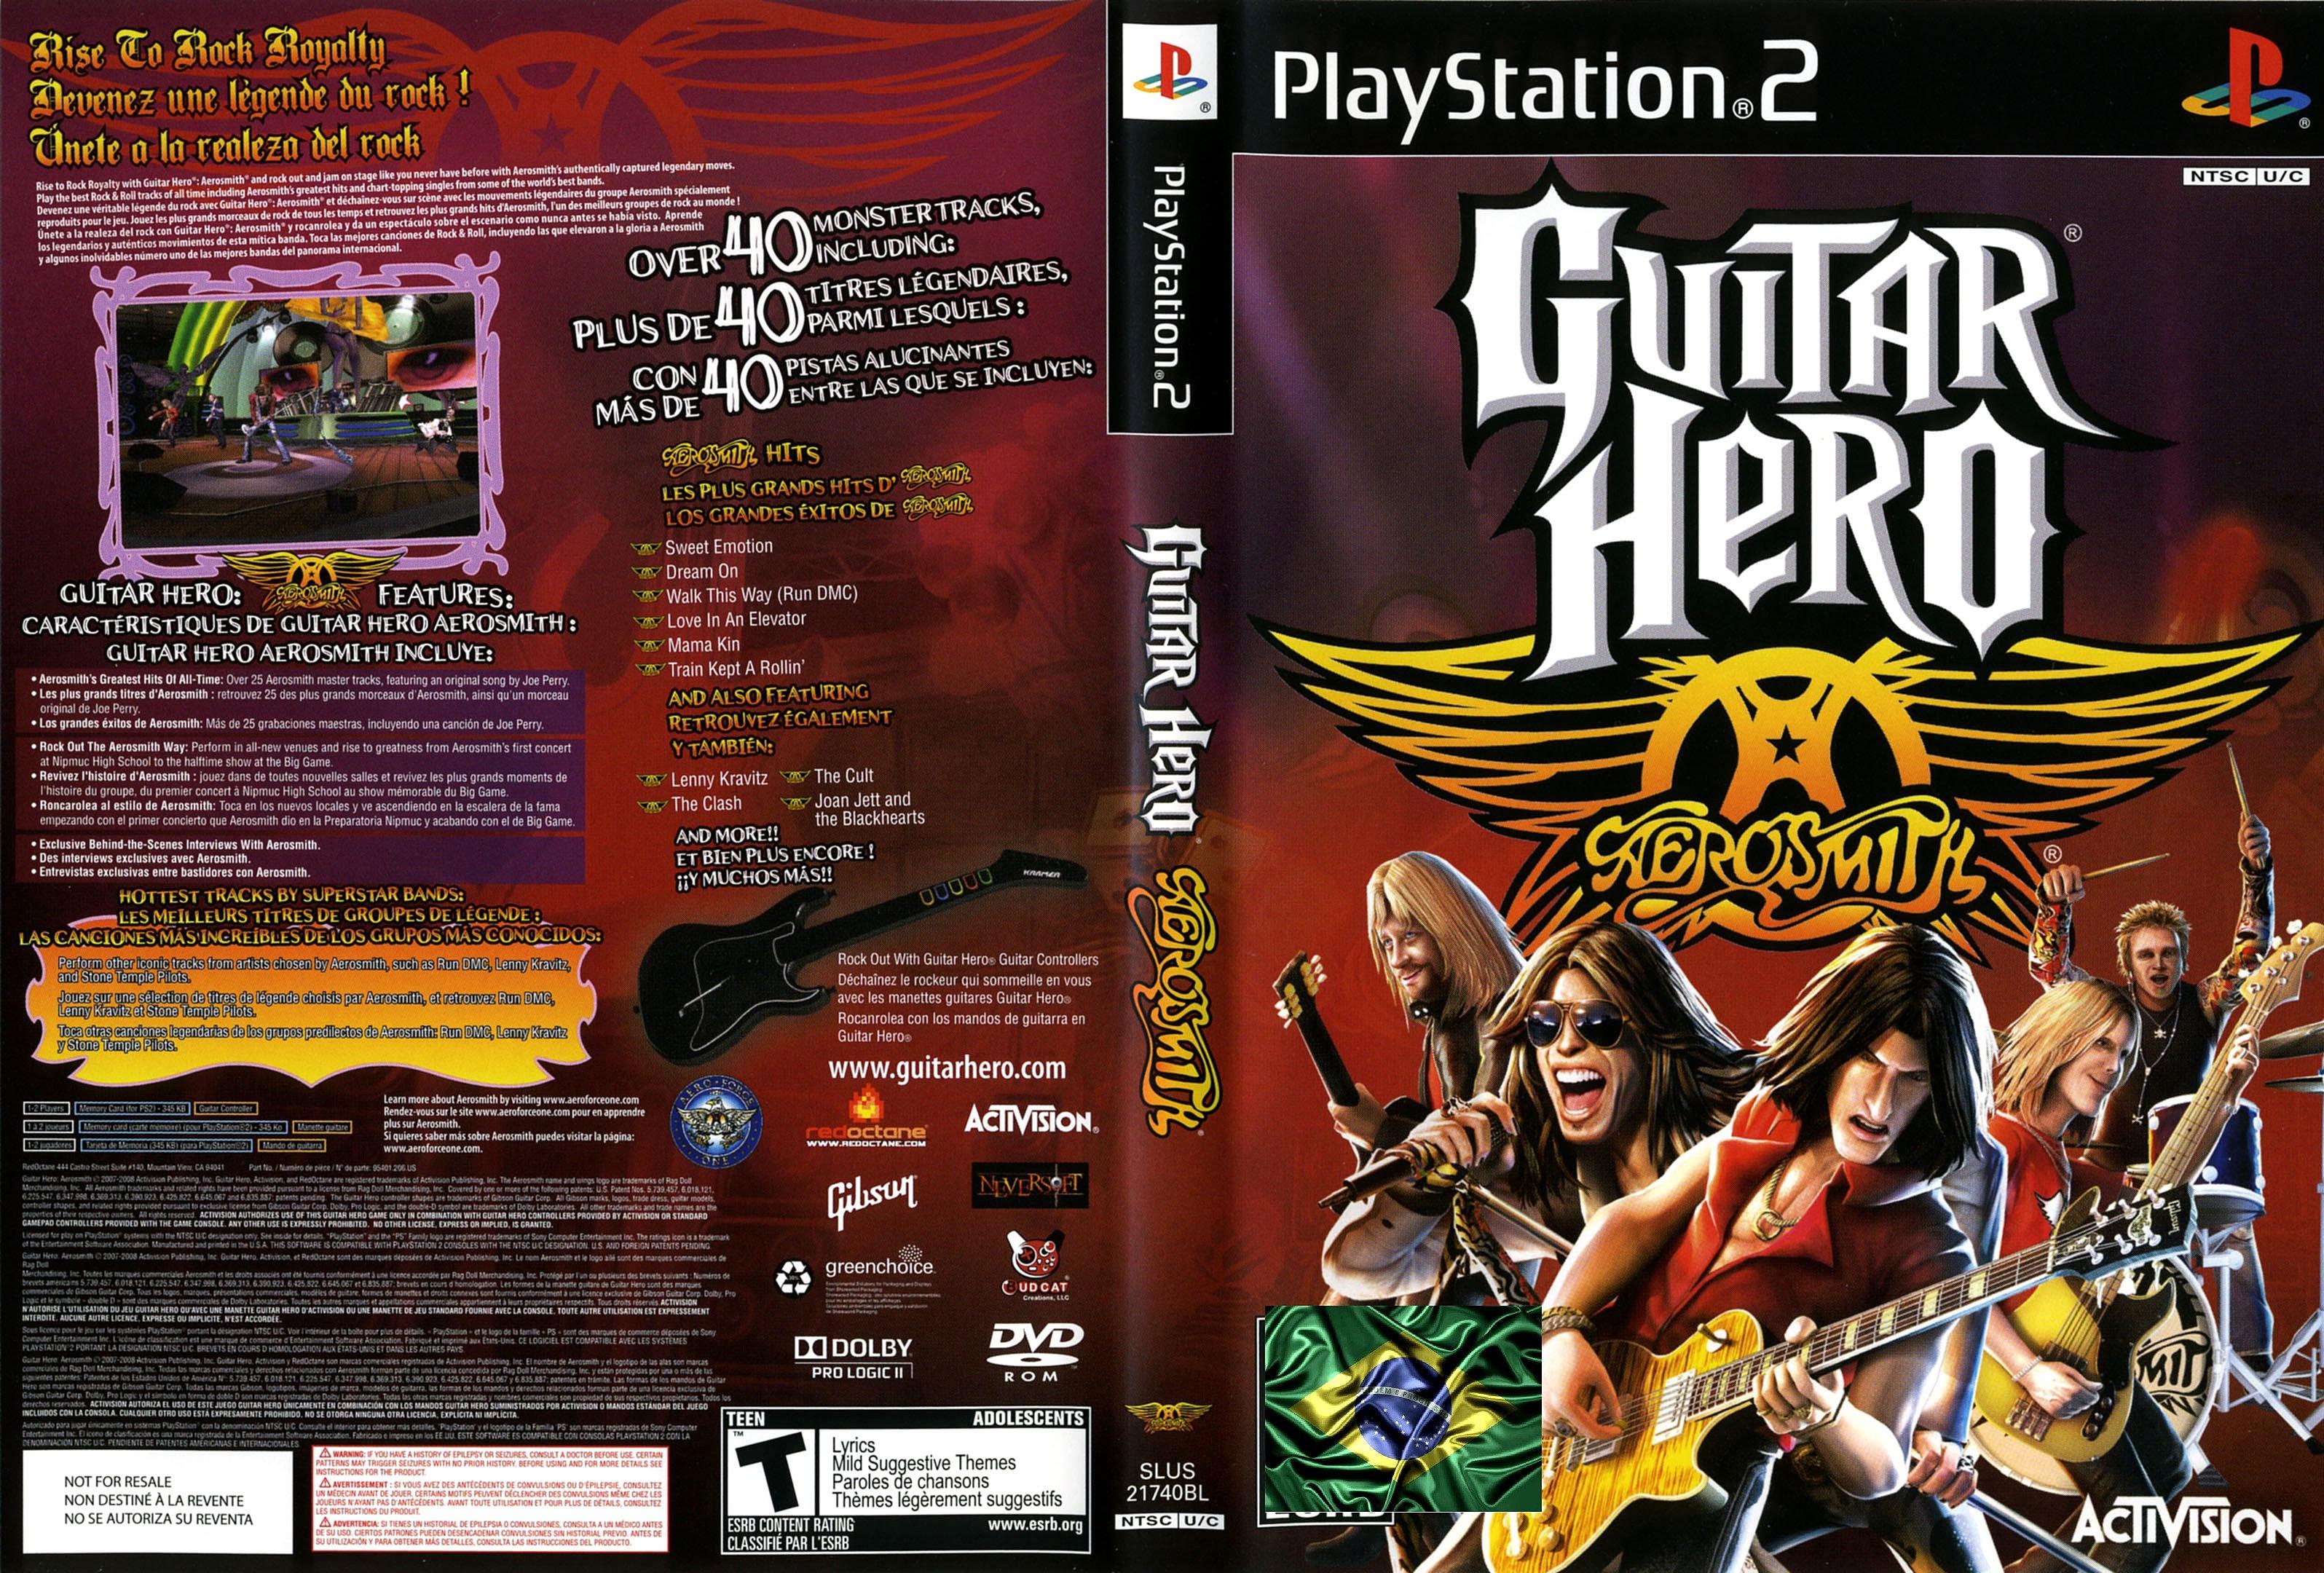 Guitar hero nude mod xxx image